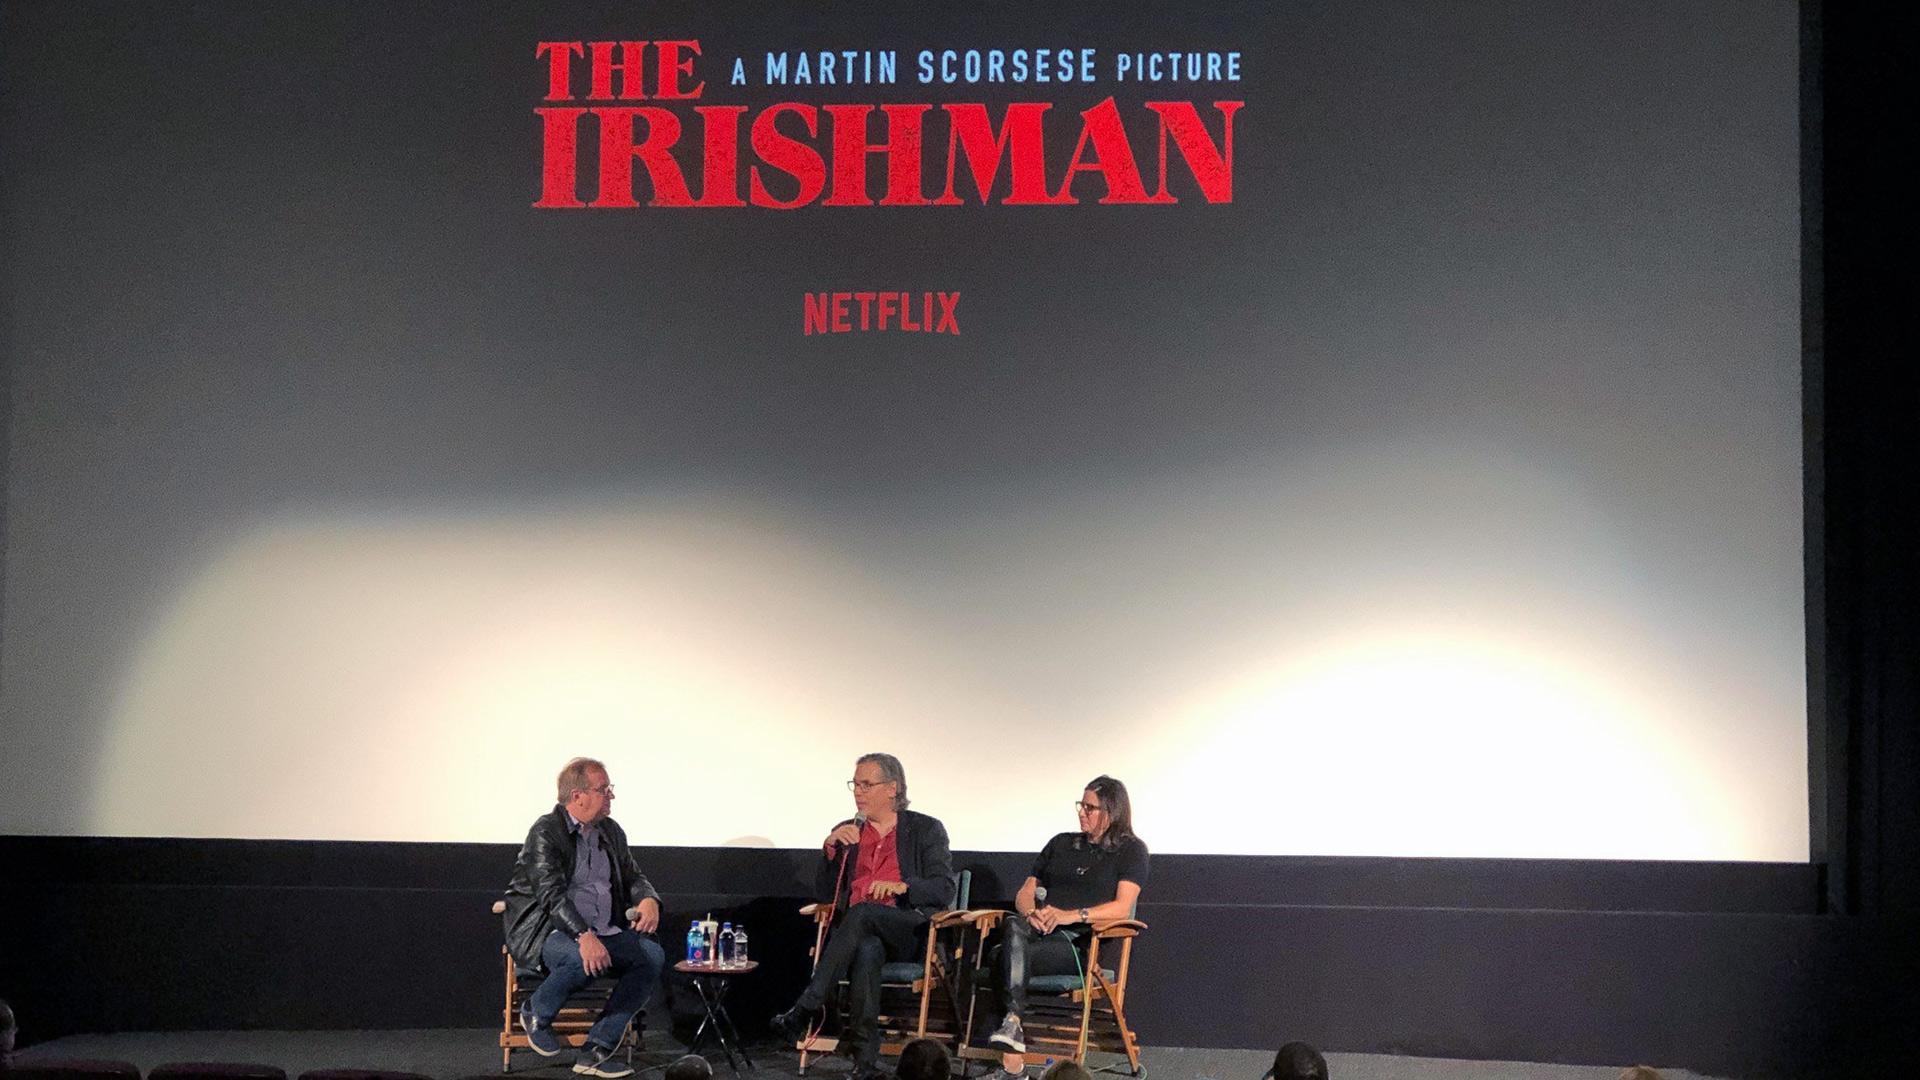 Q&A with moderator Pete Hammond, cinematographer Rodrigo Prieto and producer Emma Tillinger Koskoff.